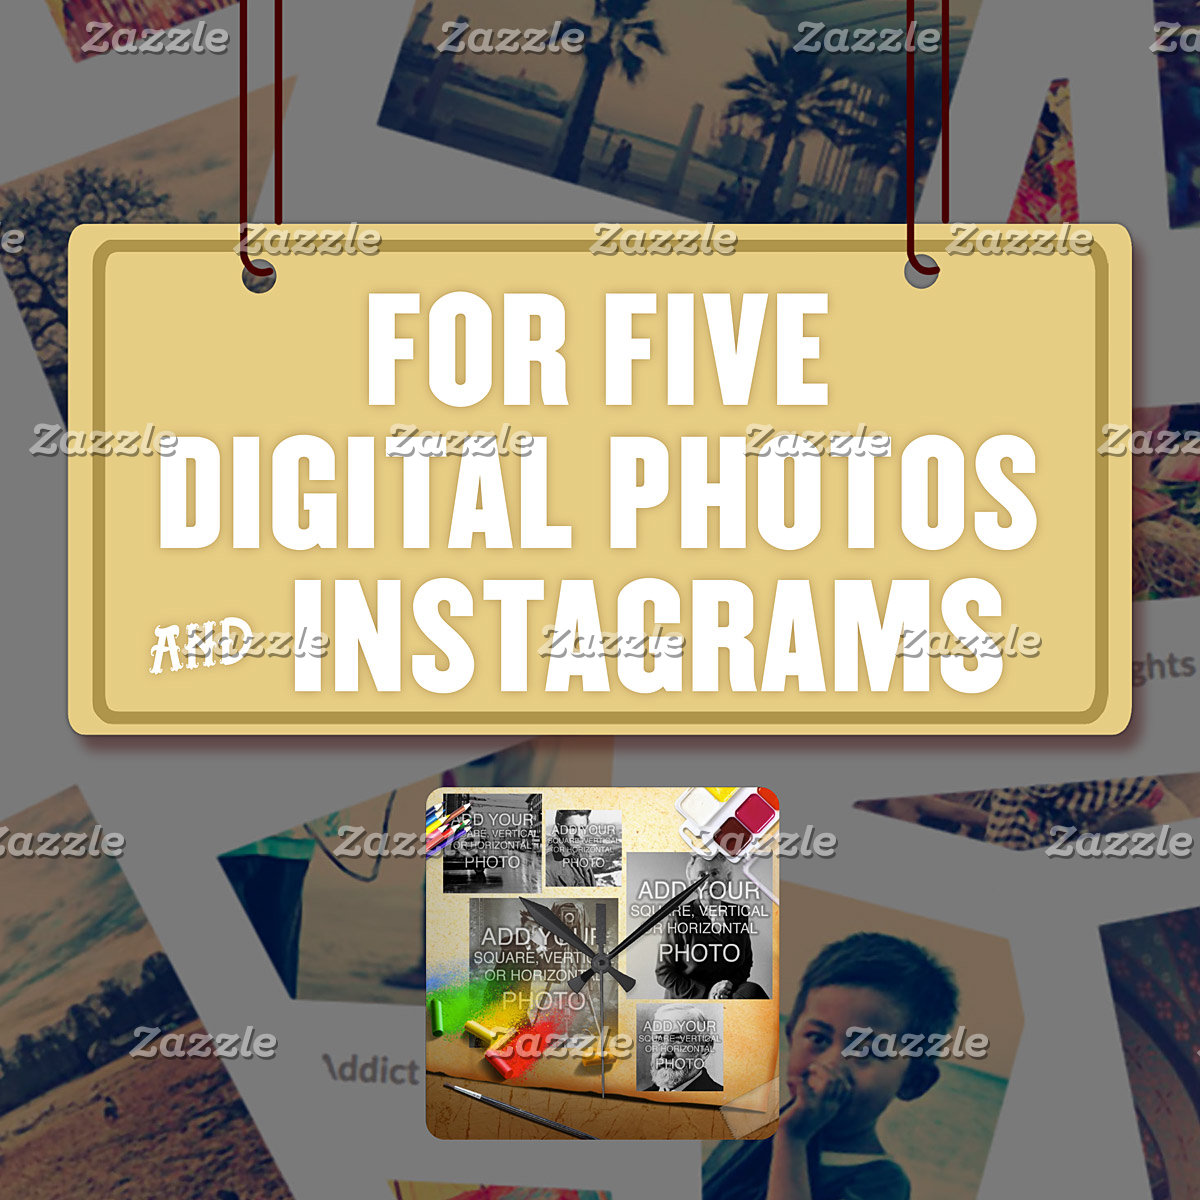 For Five (5) Digital Photos & Instagrams